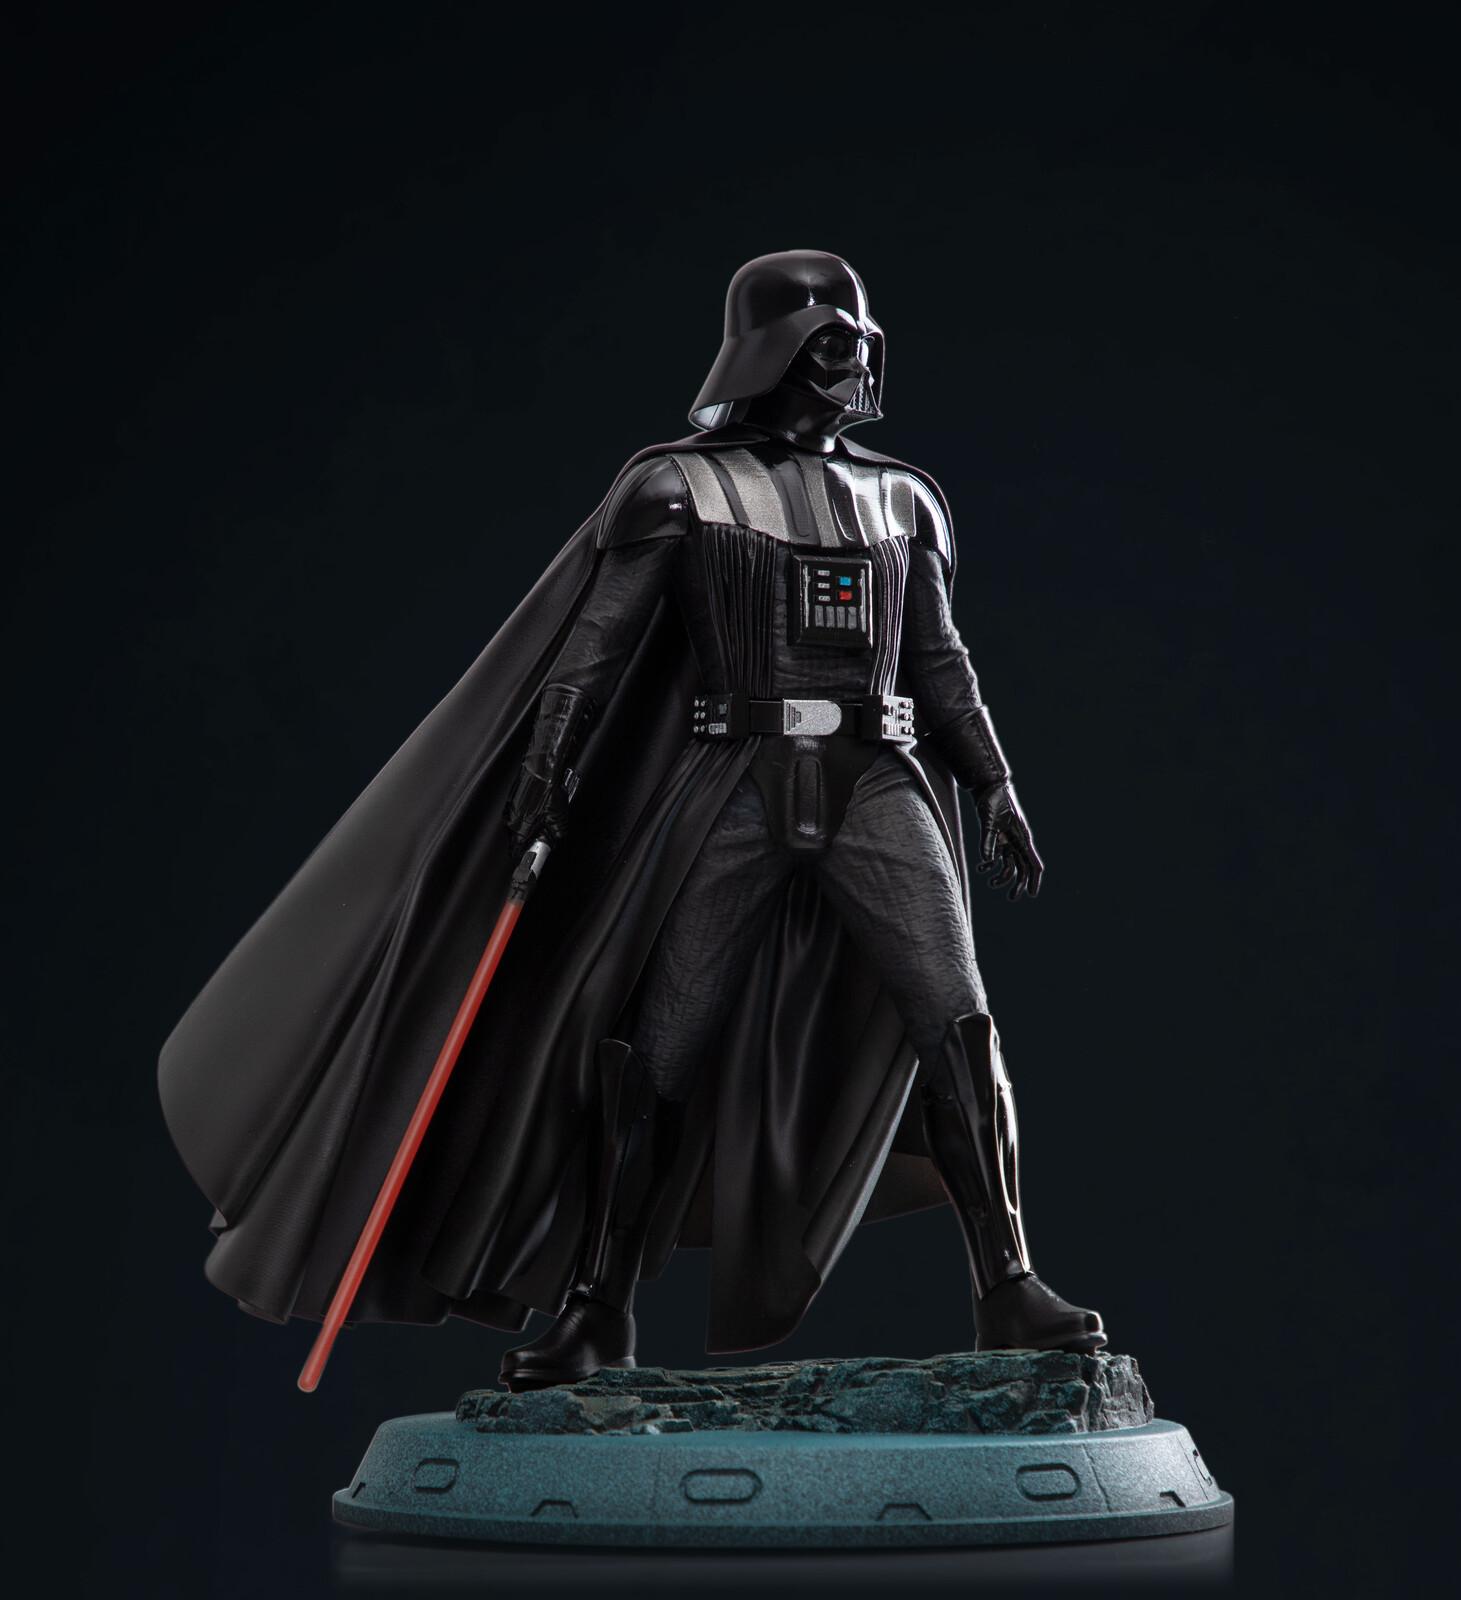 Darth Vader 3D printed Statue